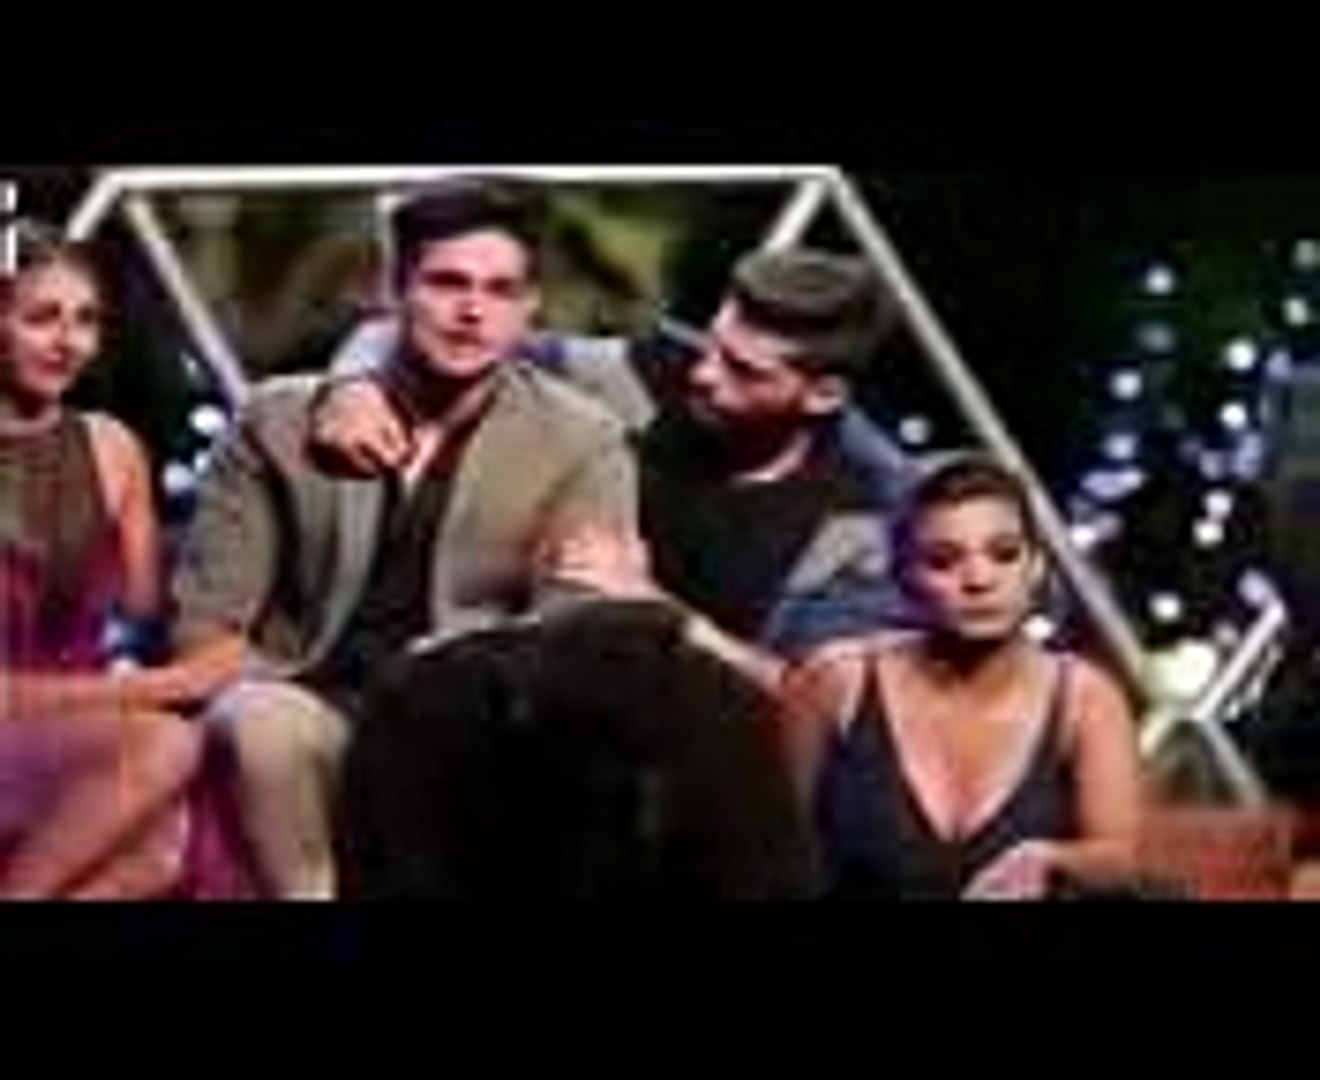 splitsvilla 10 episode 16 voteout divya or not